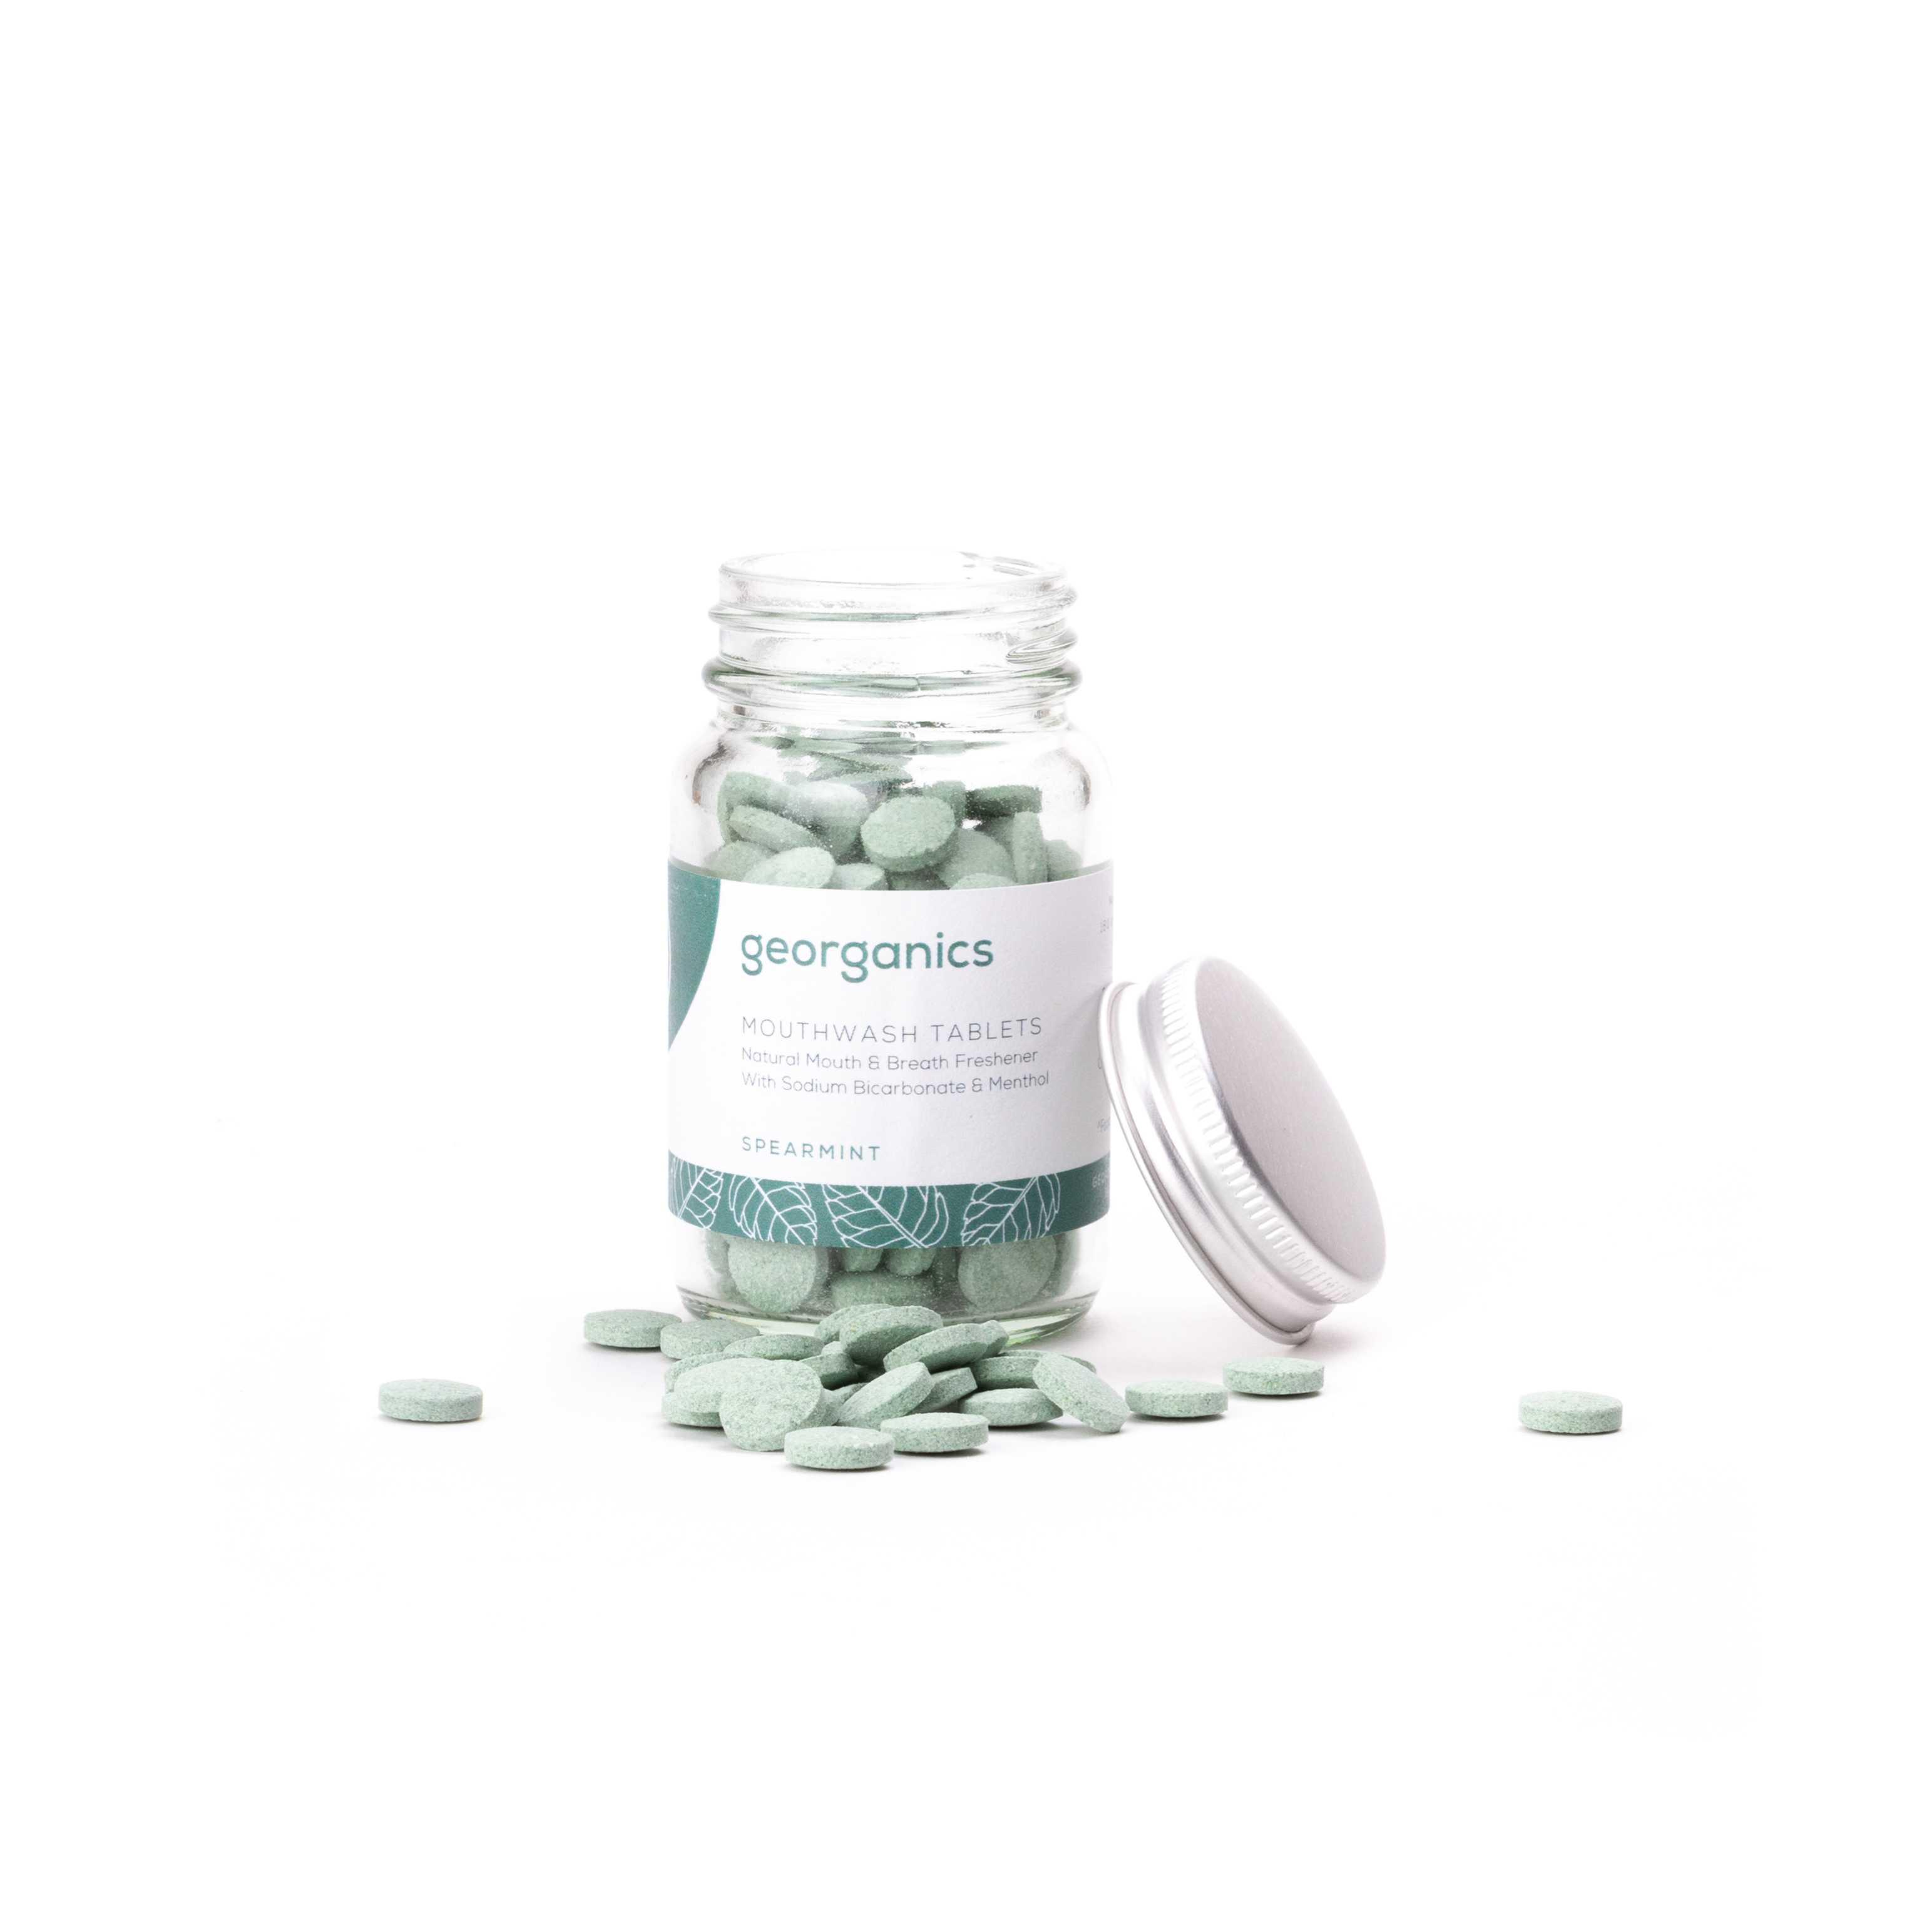 Mouthwash Tablets | Georganics